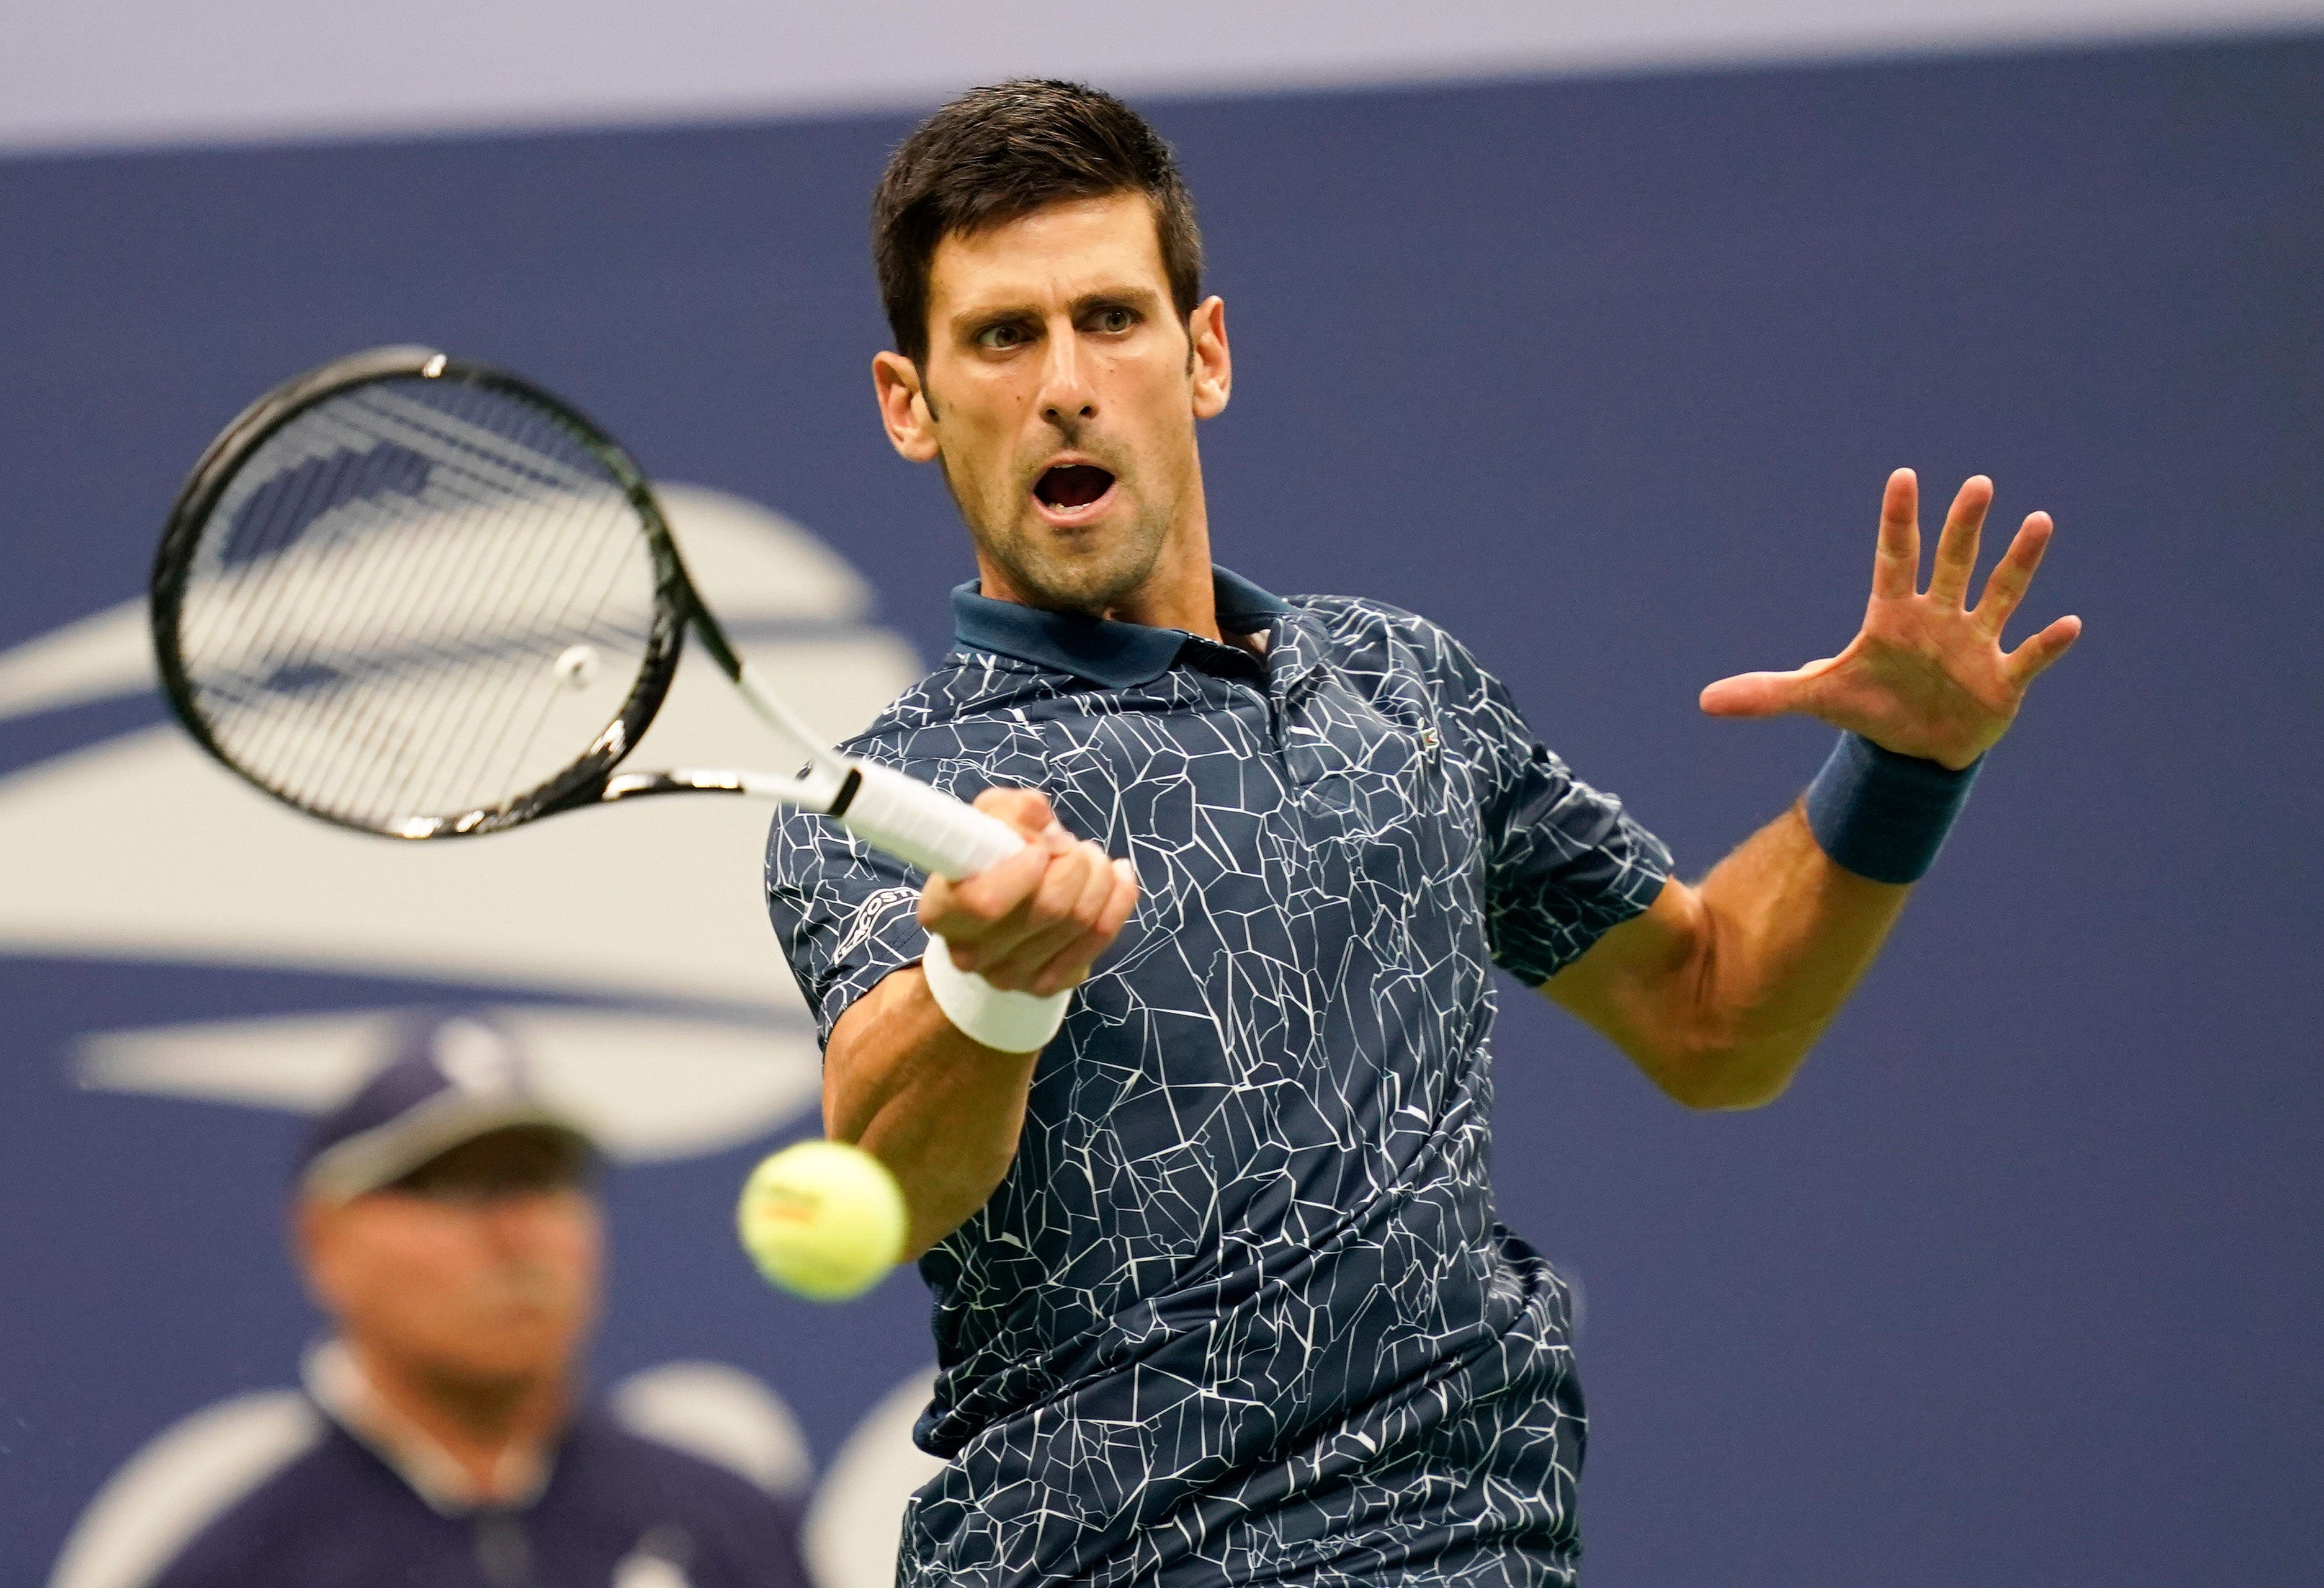 Novak Djokovic defeats Juan Martin del Potro to win third career US Open title